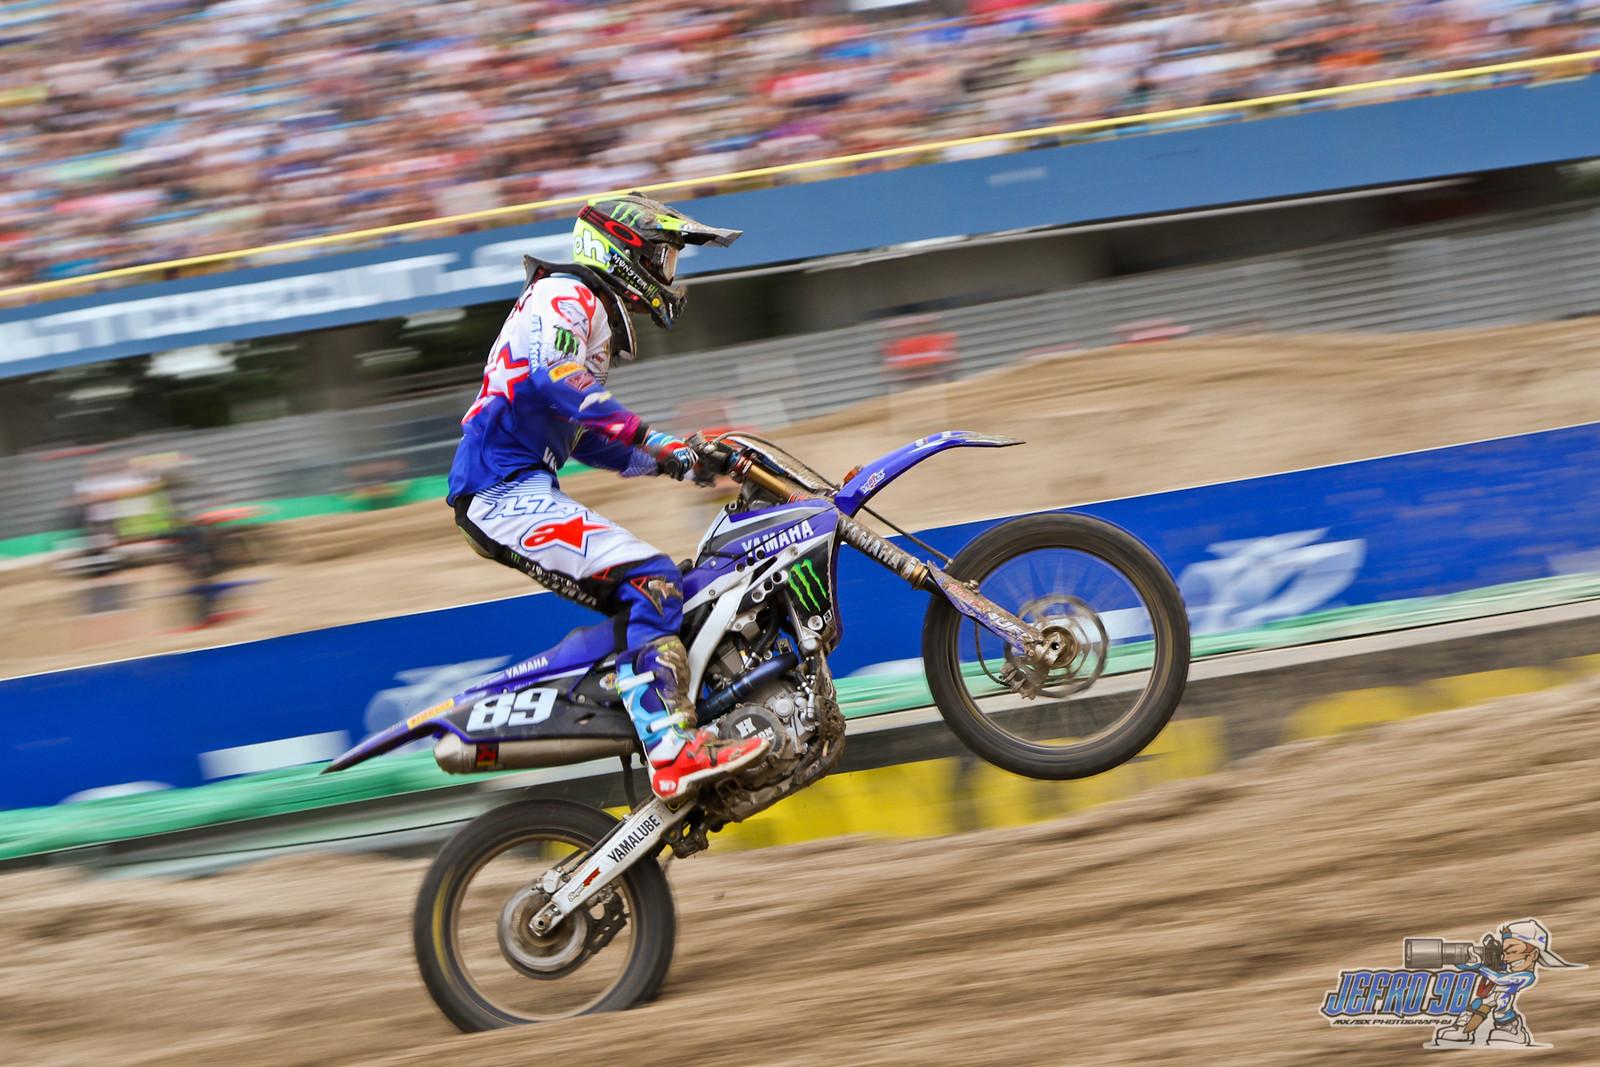 Jeremy van Horebeek - Photo Gallery: MXGP of the Netherlands - Motocross Pictures - Vital MX